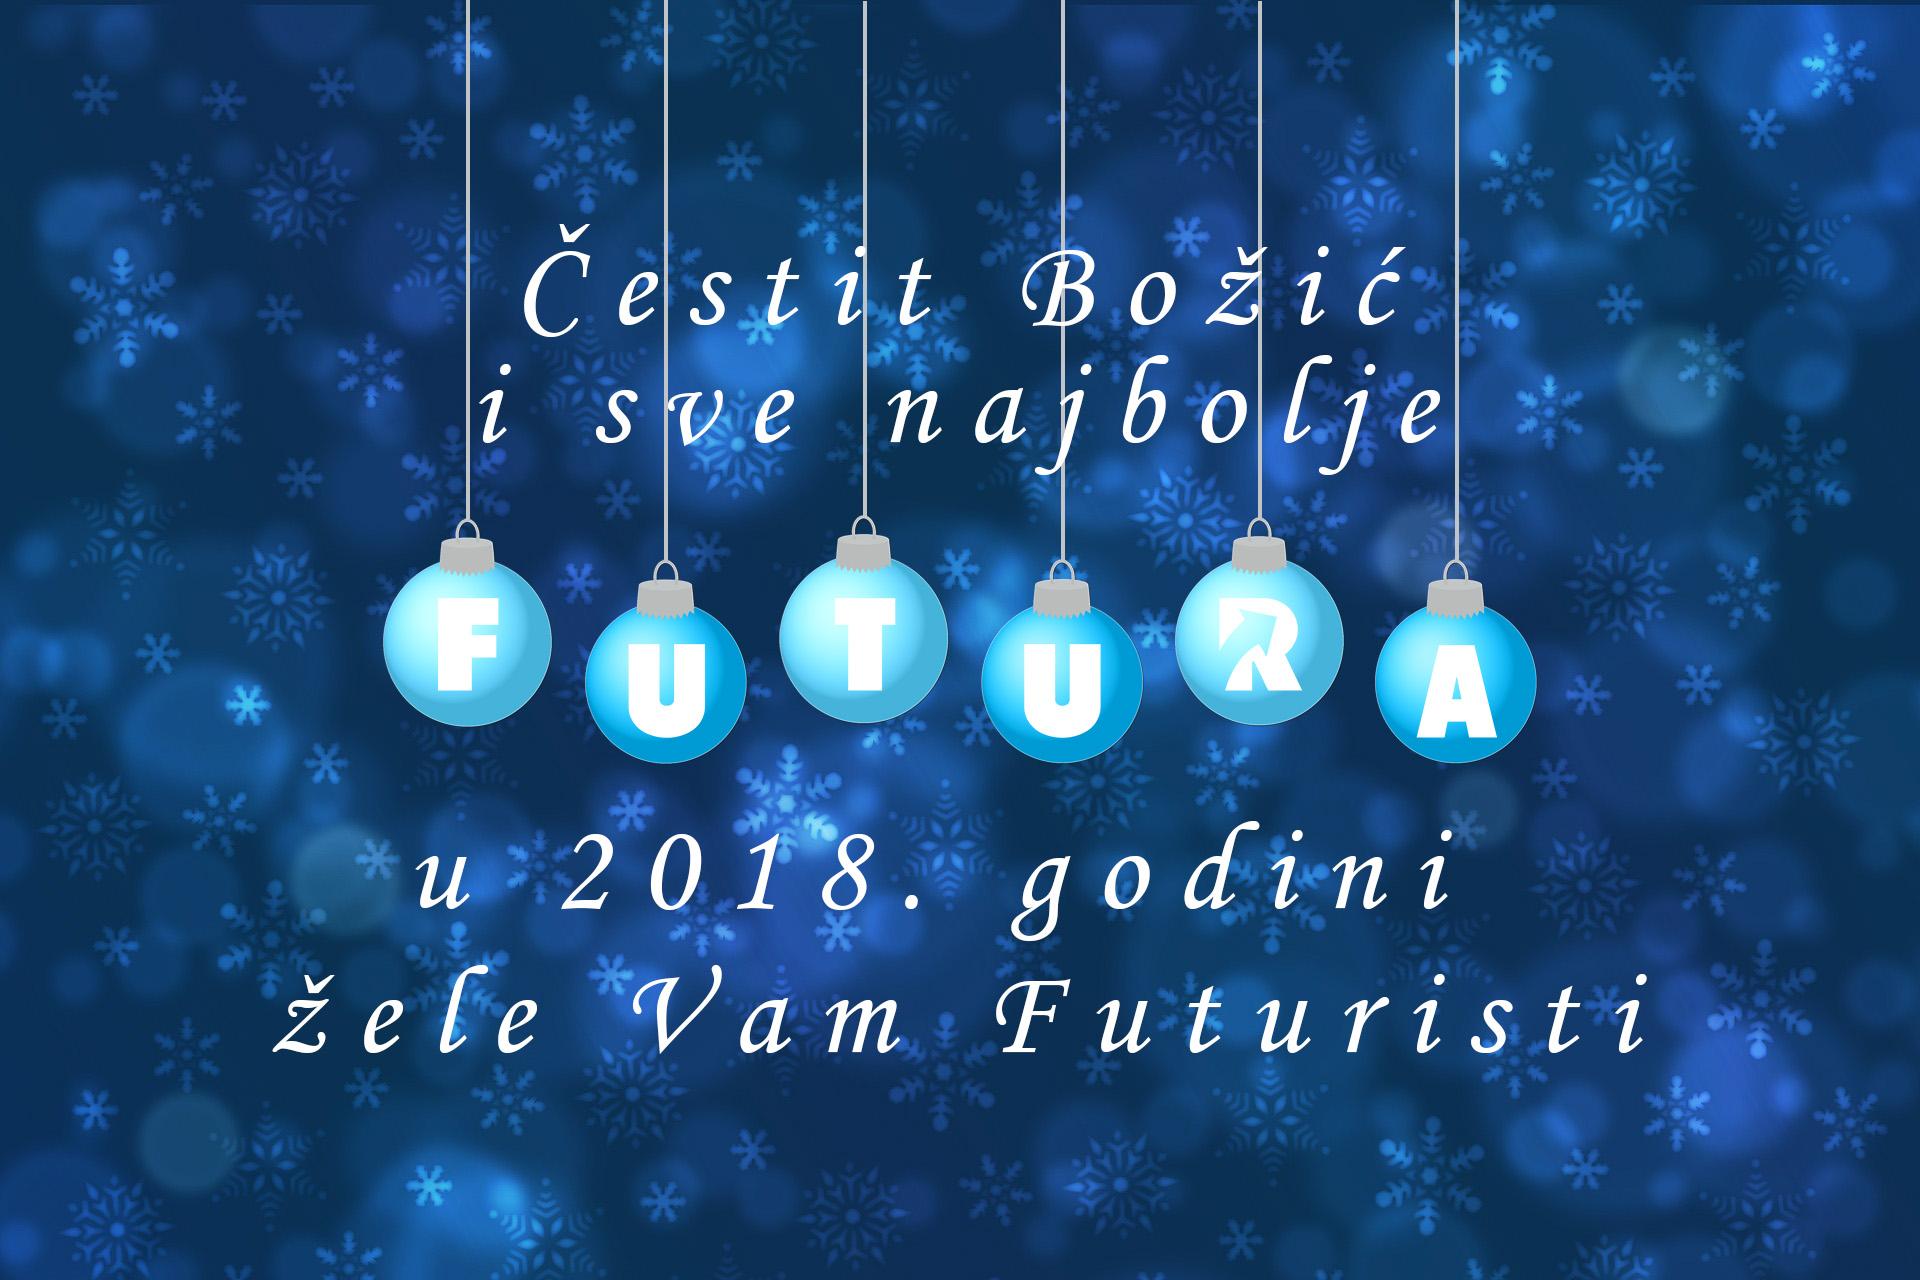 cestitka_bozicna2017